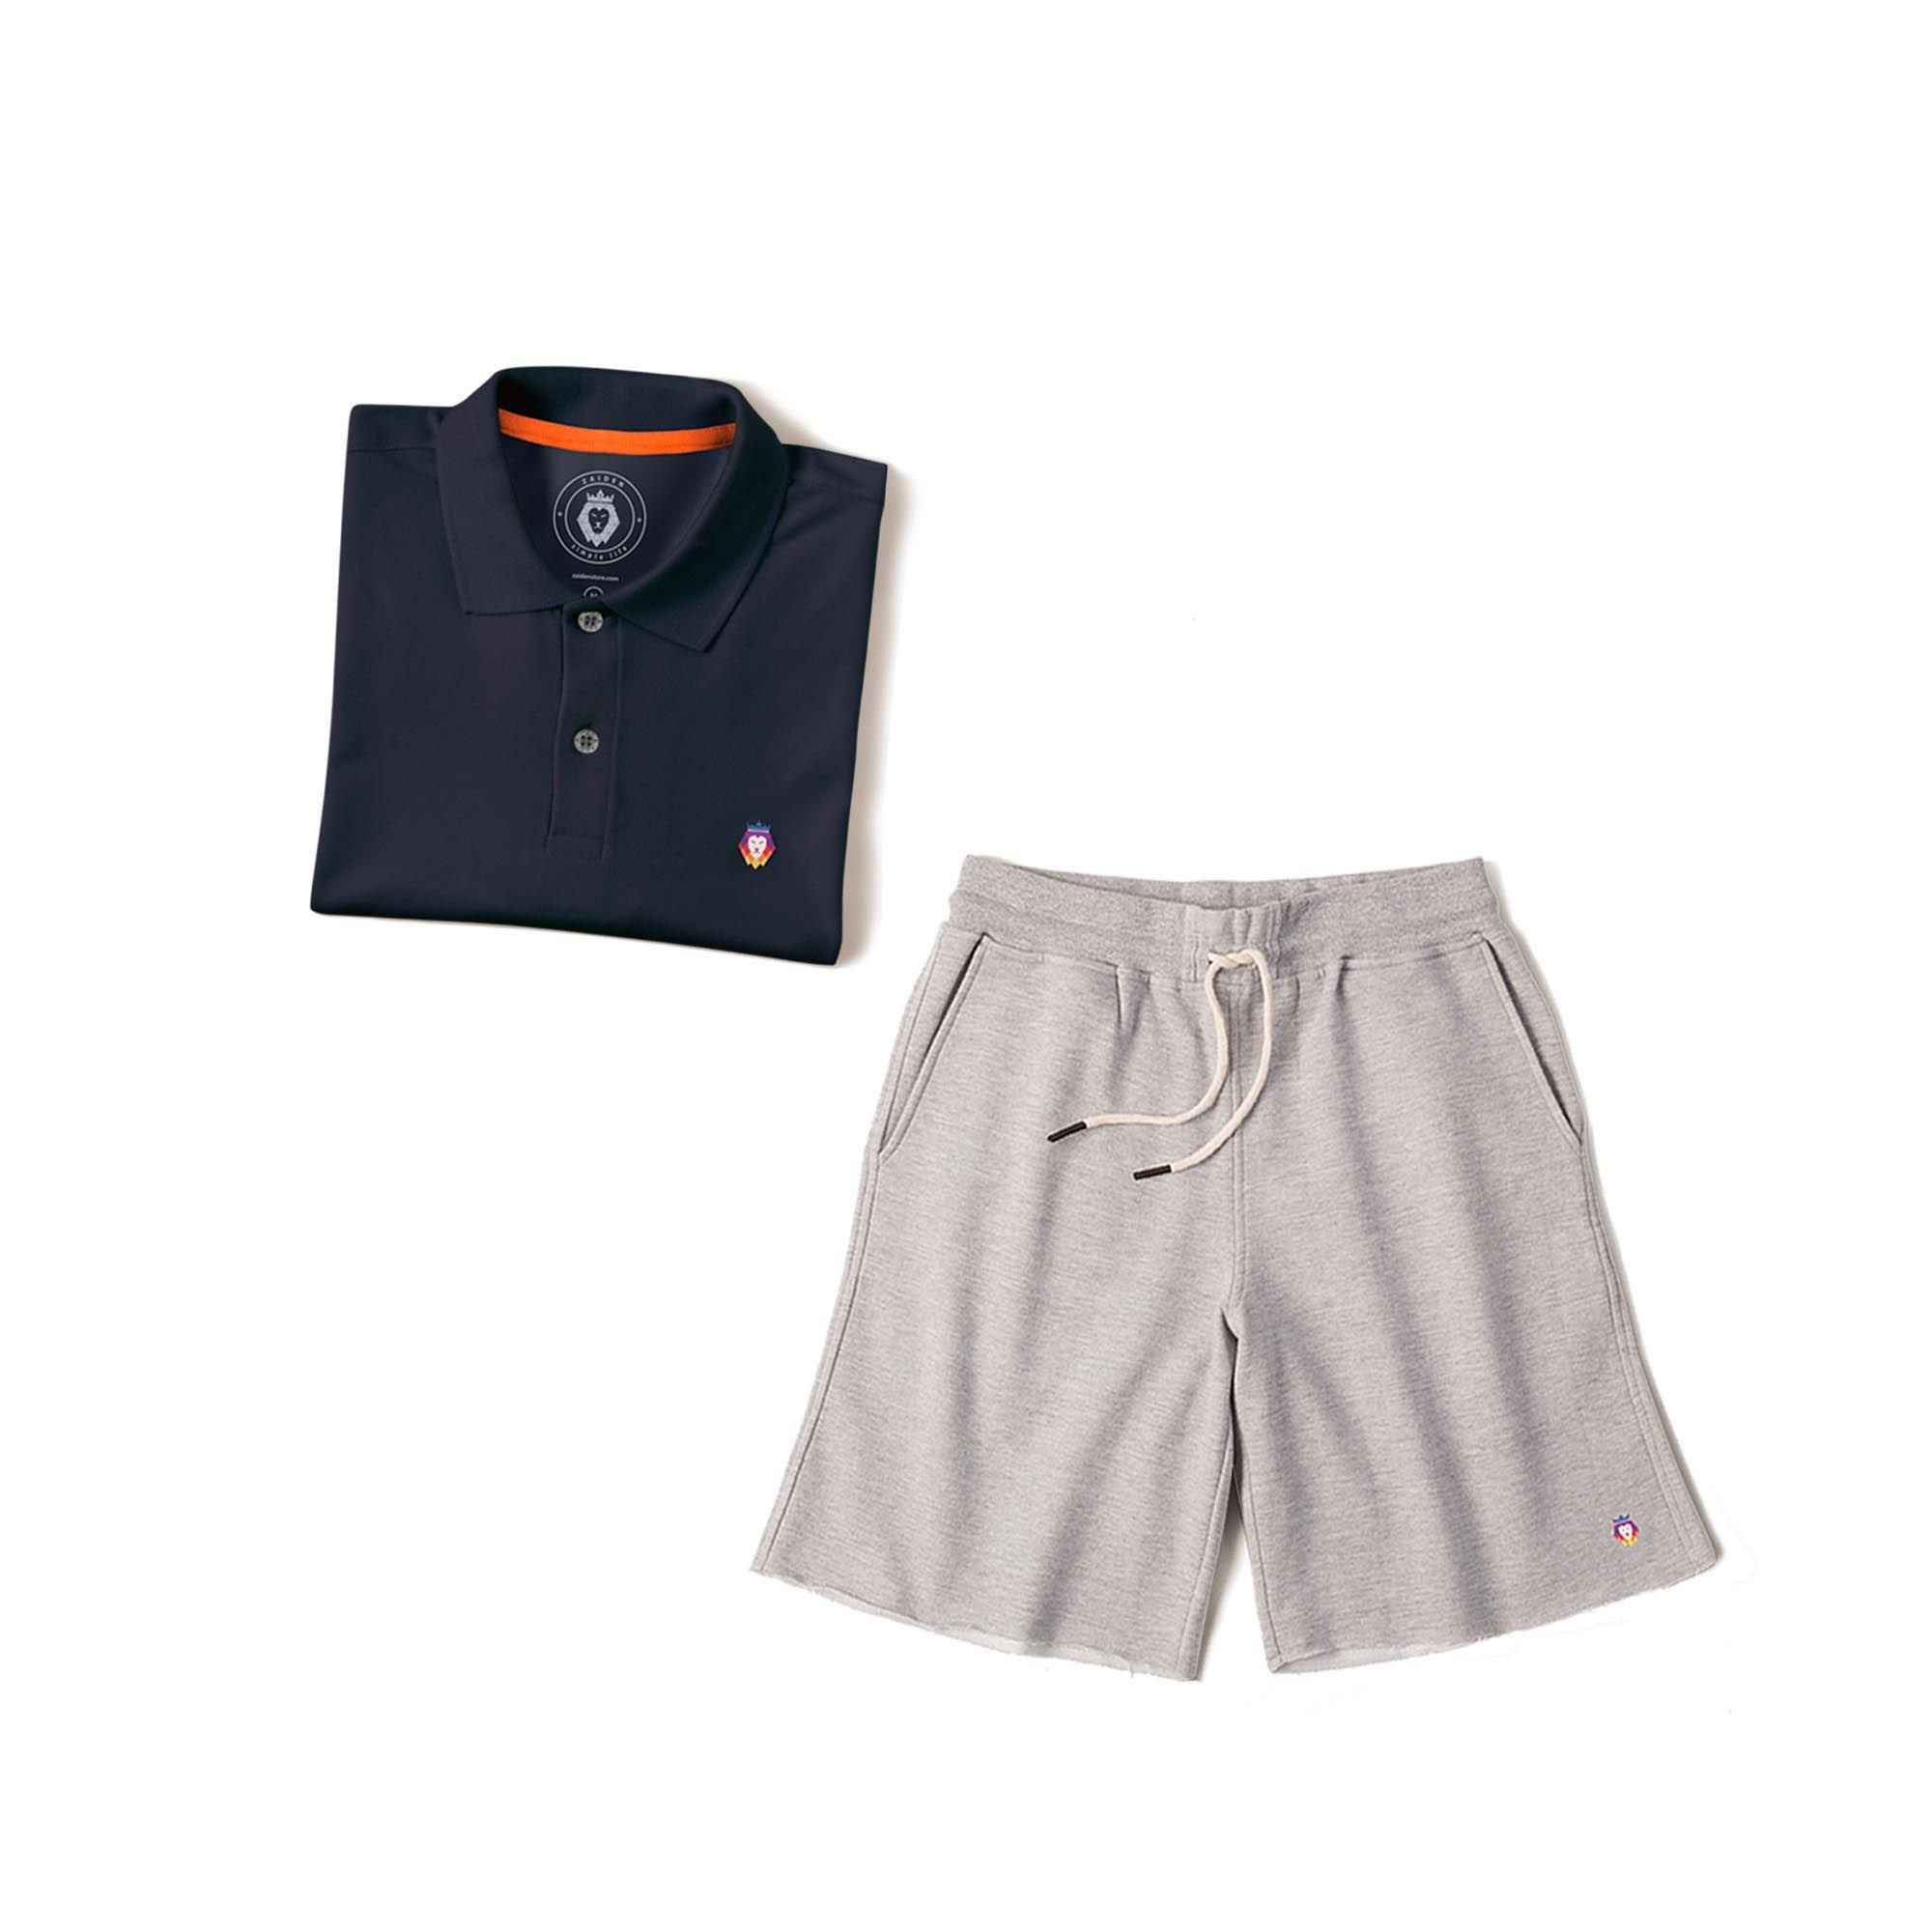 7242d2b09 Kit 1 Bermuda Basic Mescla + 1 Camisa Polo Style Azul Marinho Zaiden  Masculina - ZAIDEN ...